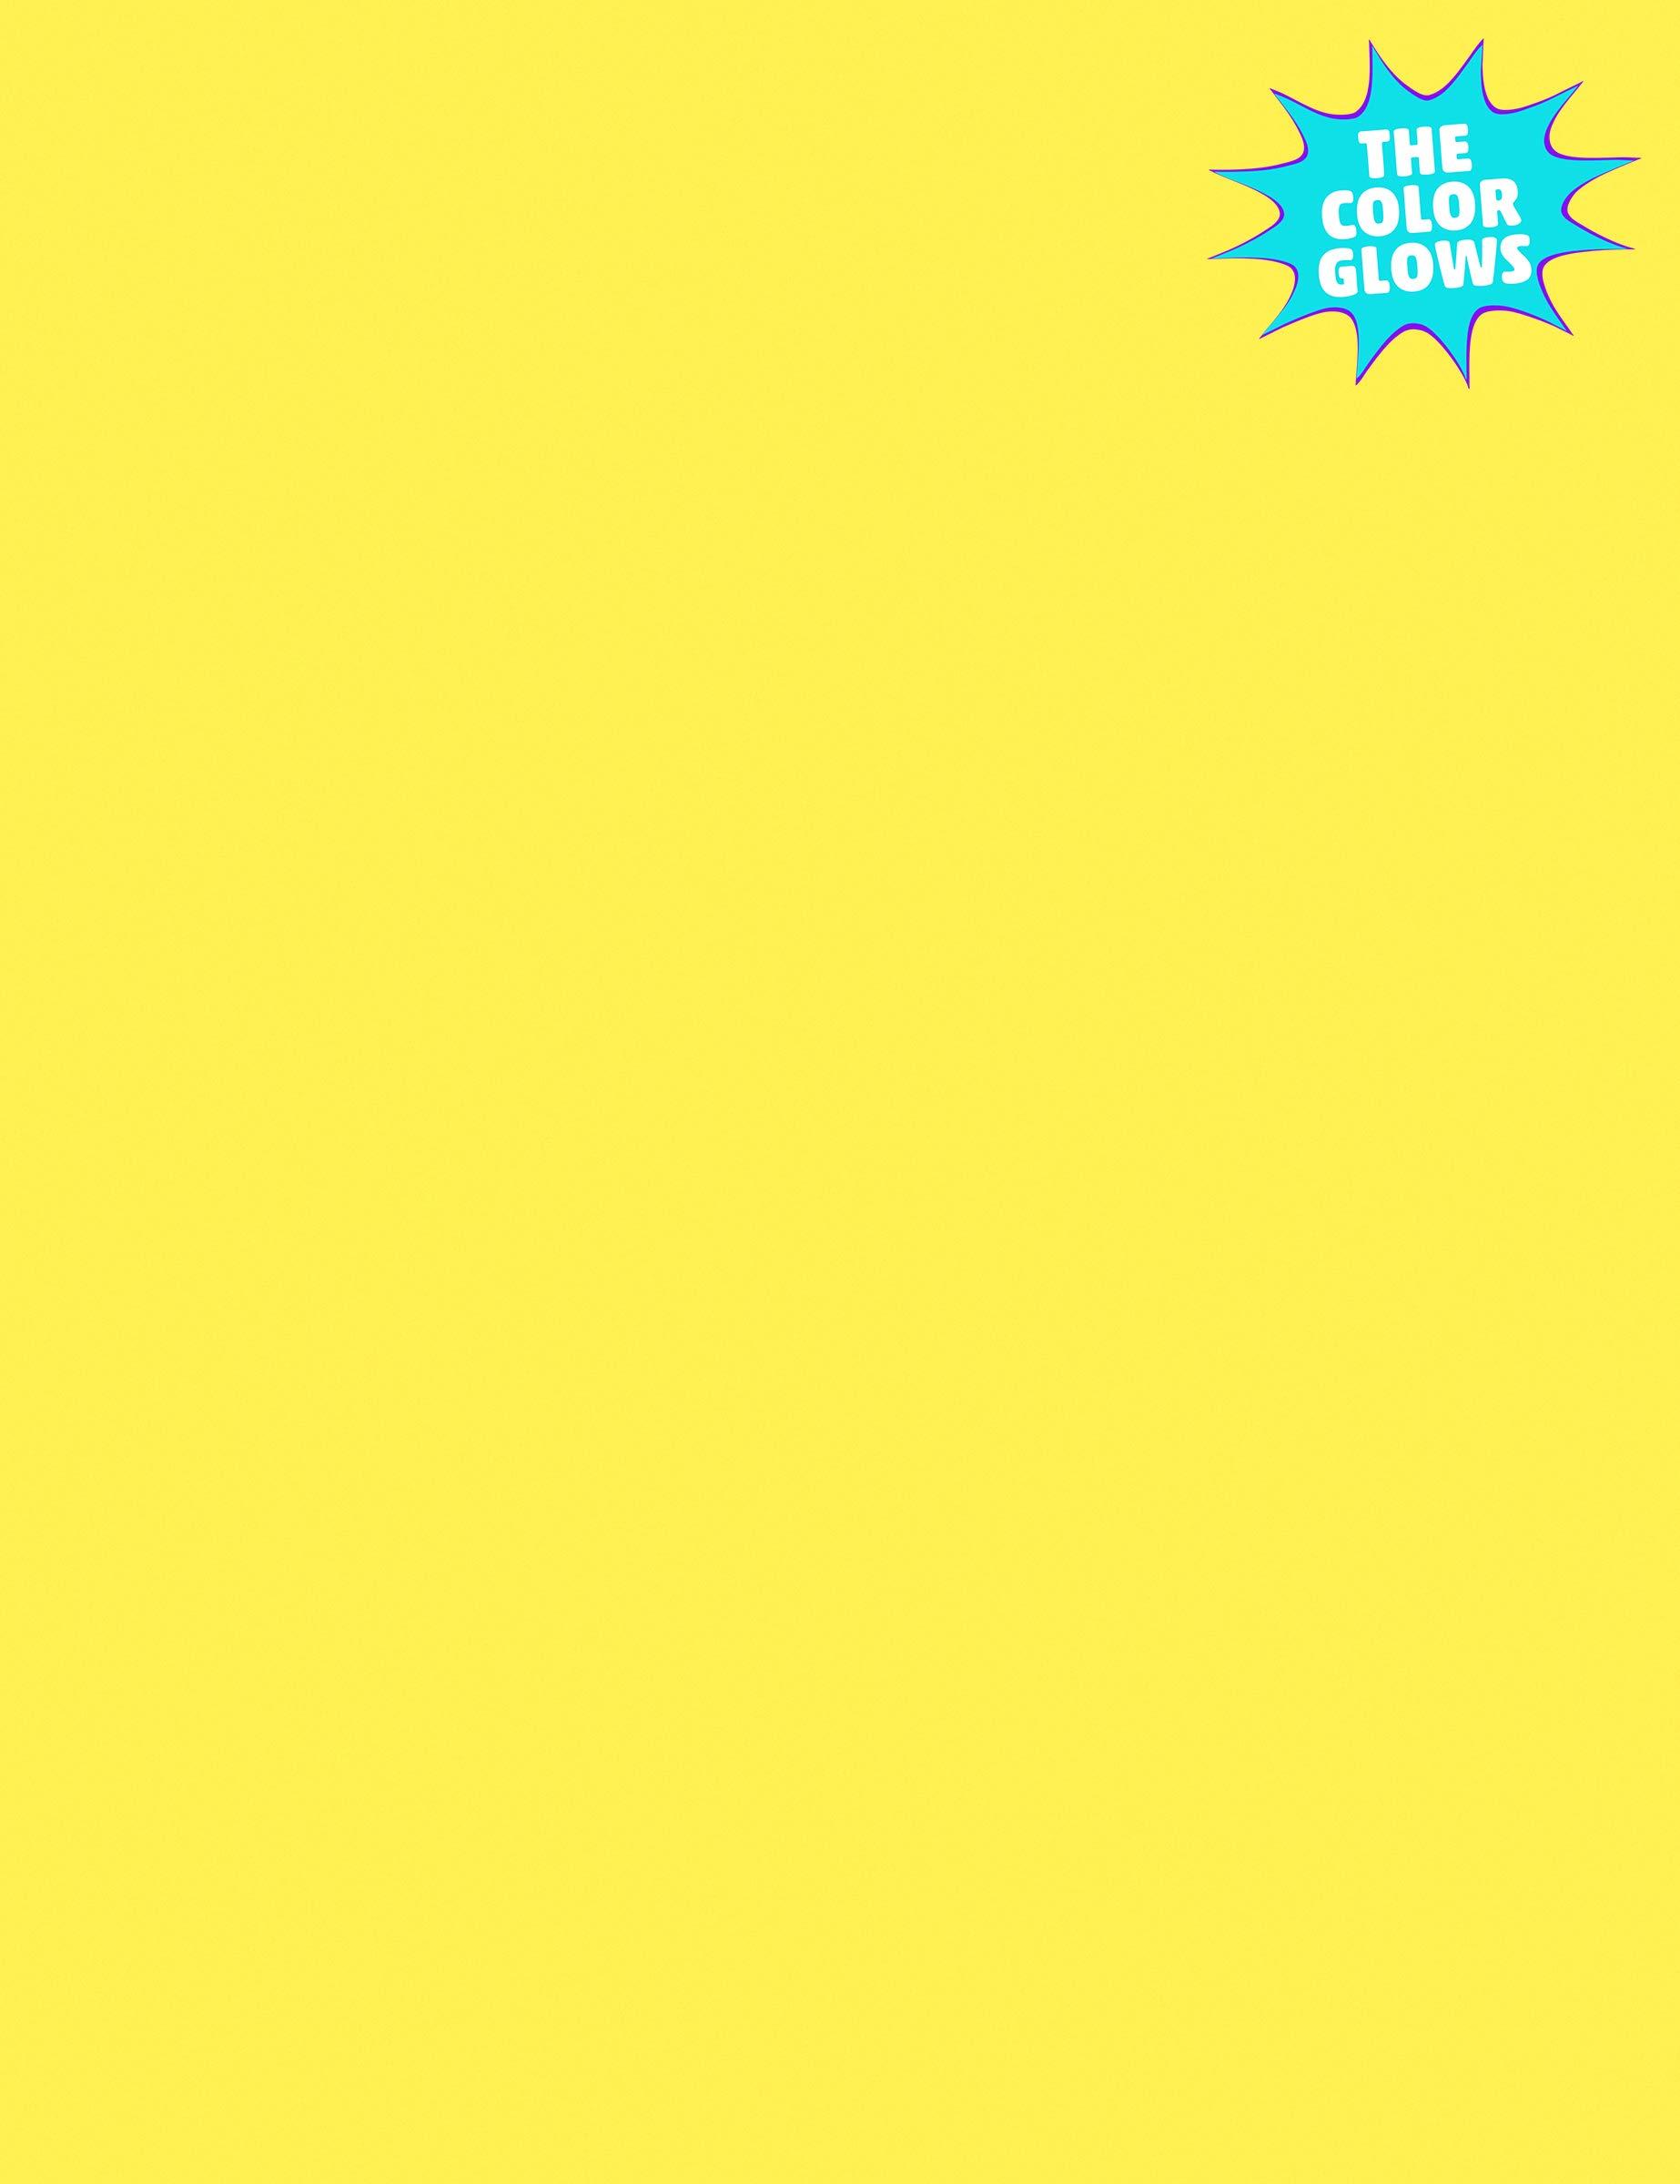 Kaleidoscope Multi-Purpose Paper, 8.5 x 11 Inches,Hyper Yellow, 500 Sheets (102200)